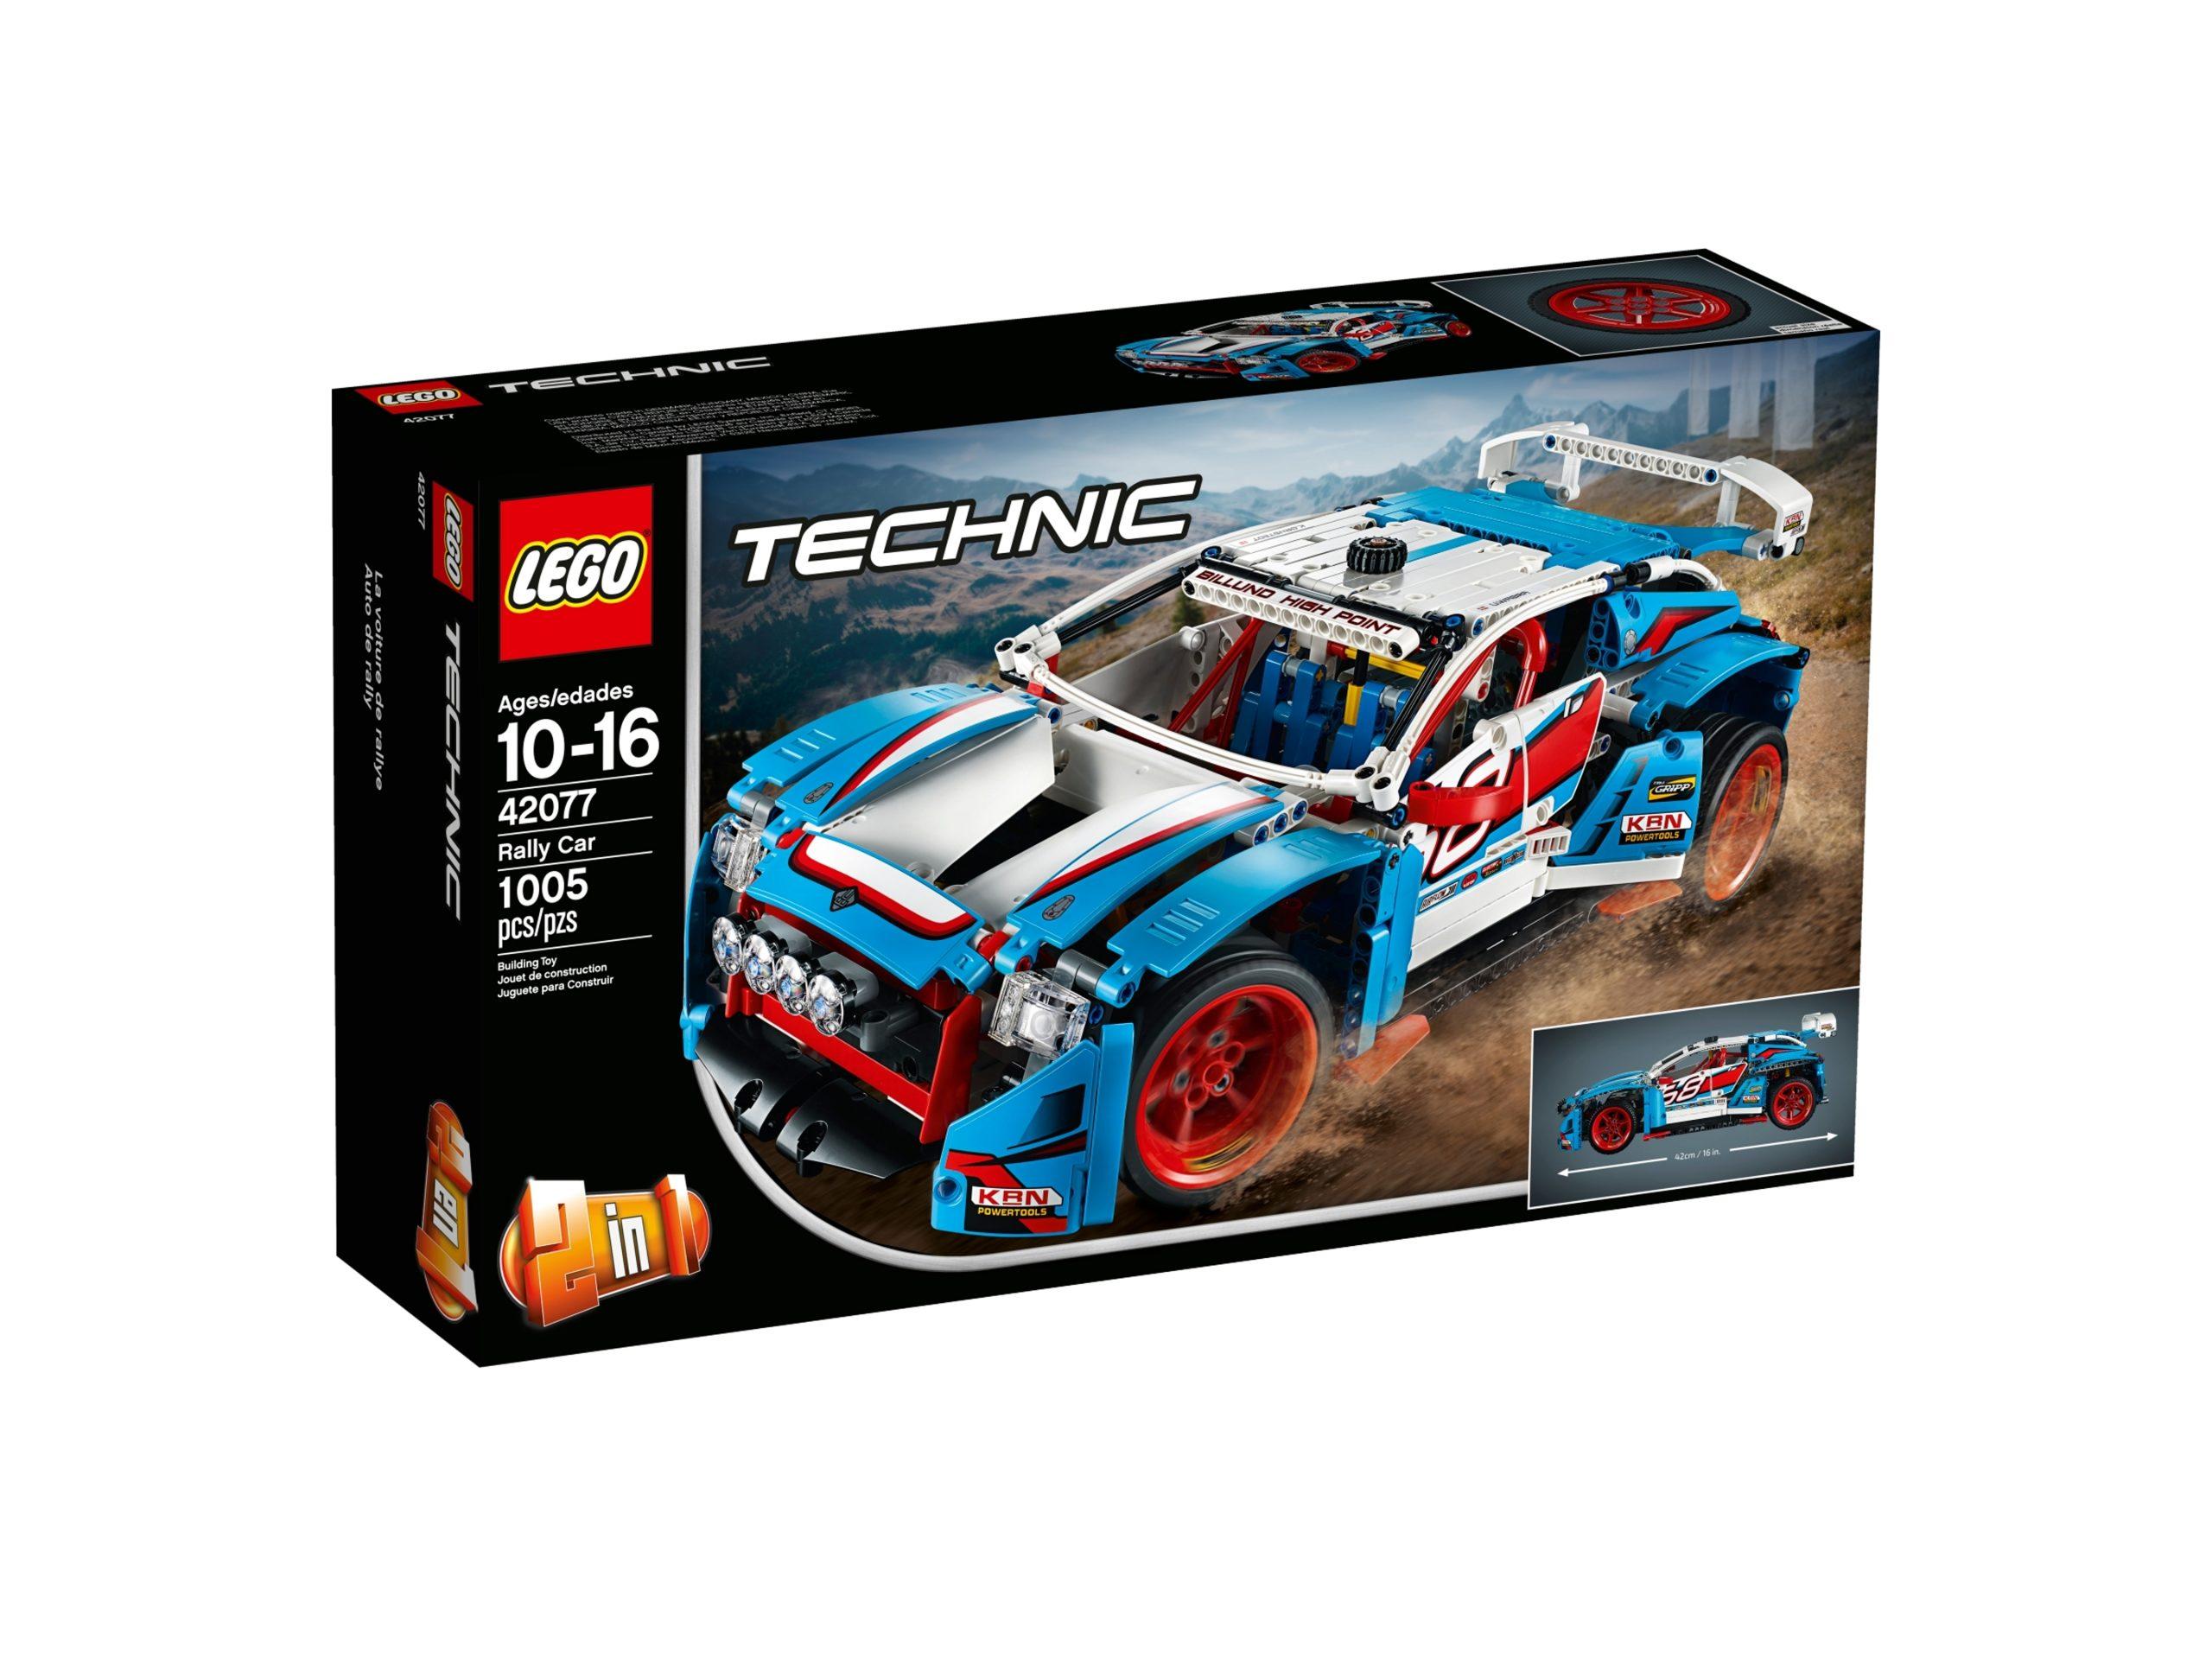 lego 42077 auto da rally scaled